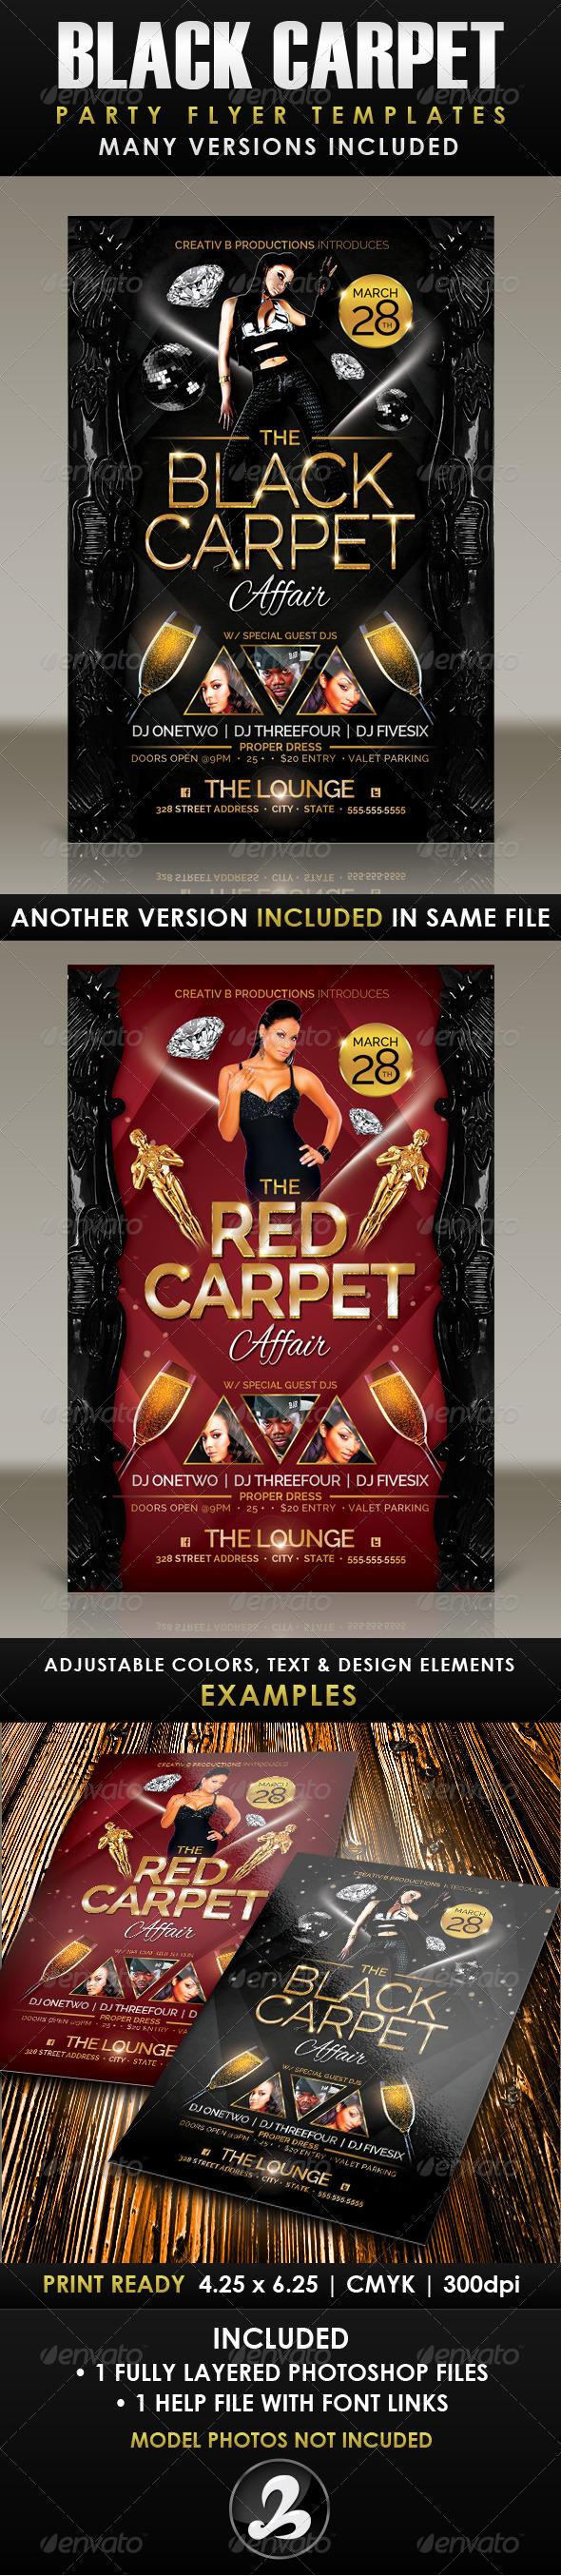 GraphicRiver Black Carpet Party Flyer Template 6943358